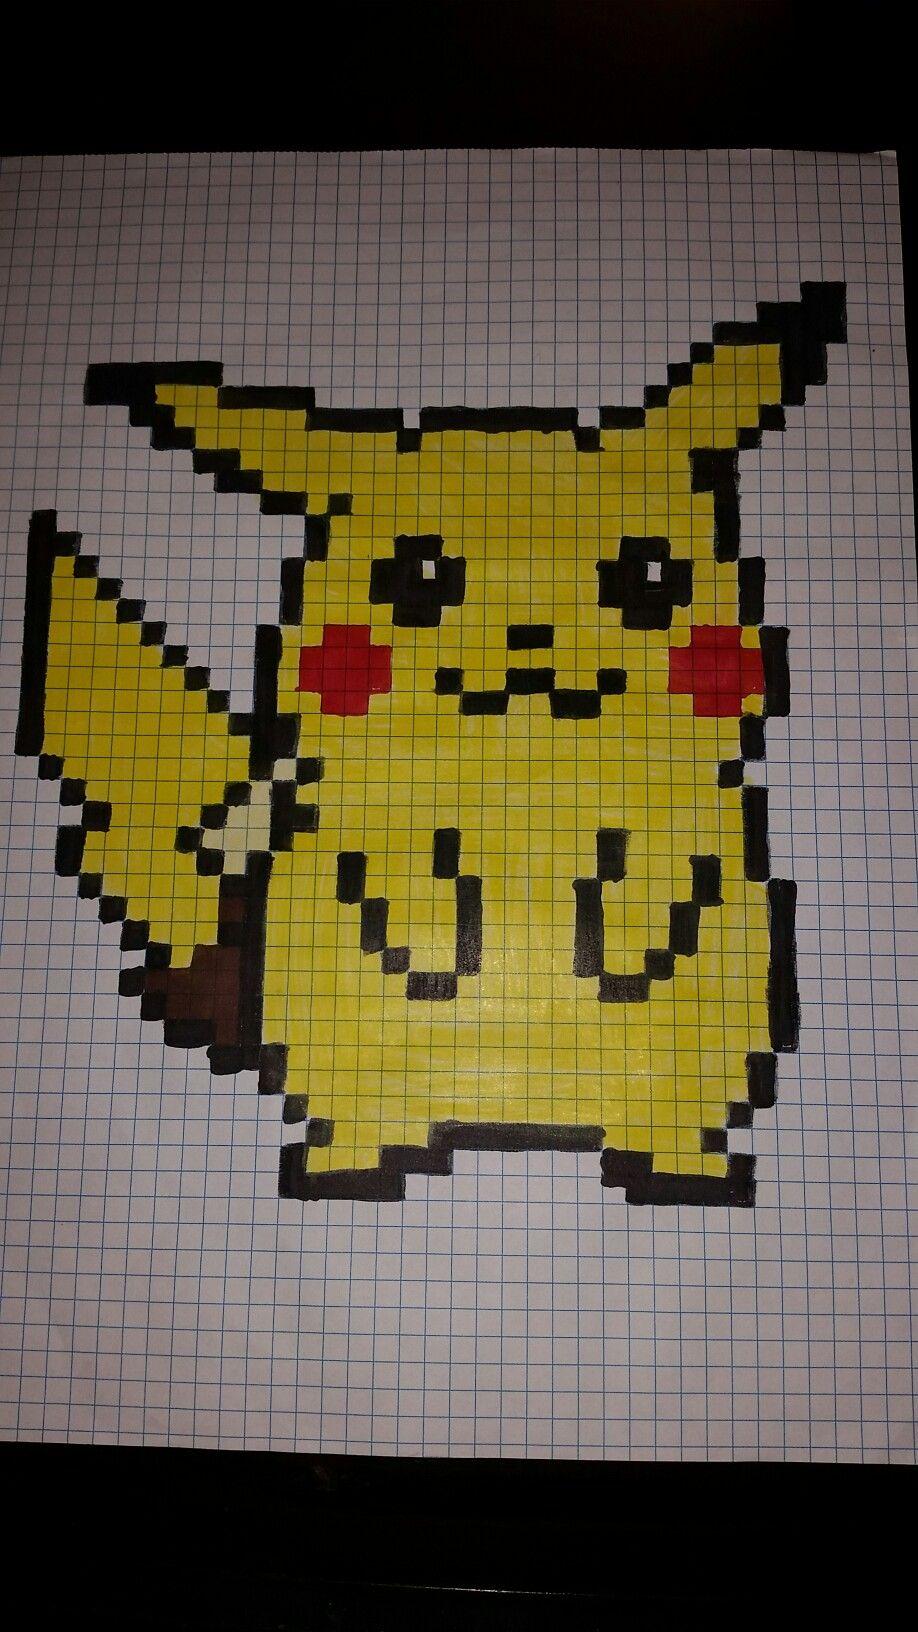 Pikachu Pixel Art Dibujos En Cuadricula Dibujos Kawaii Arte Pixel